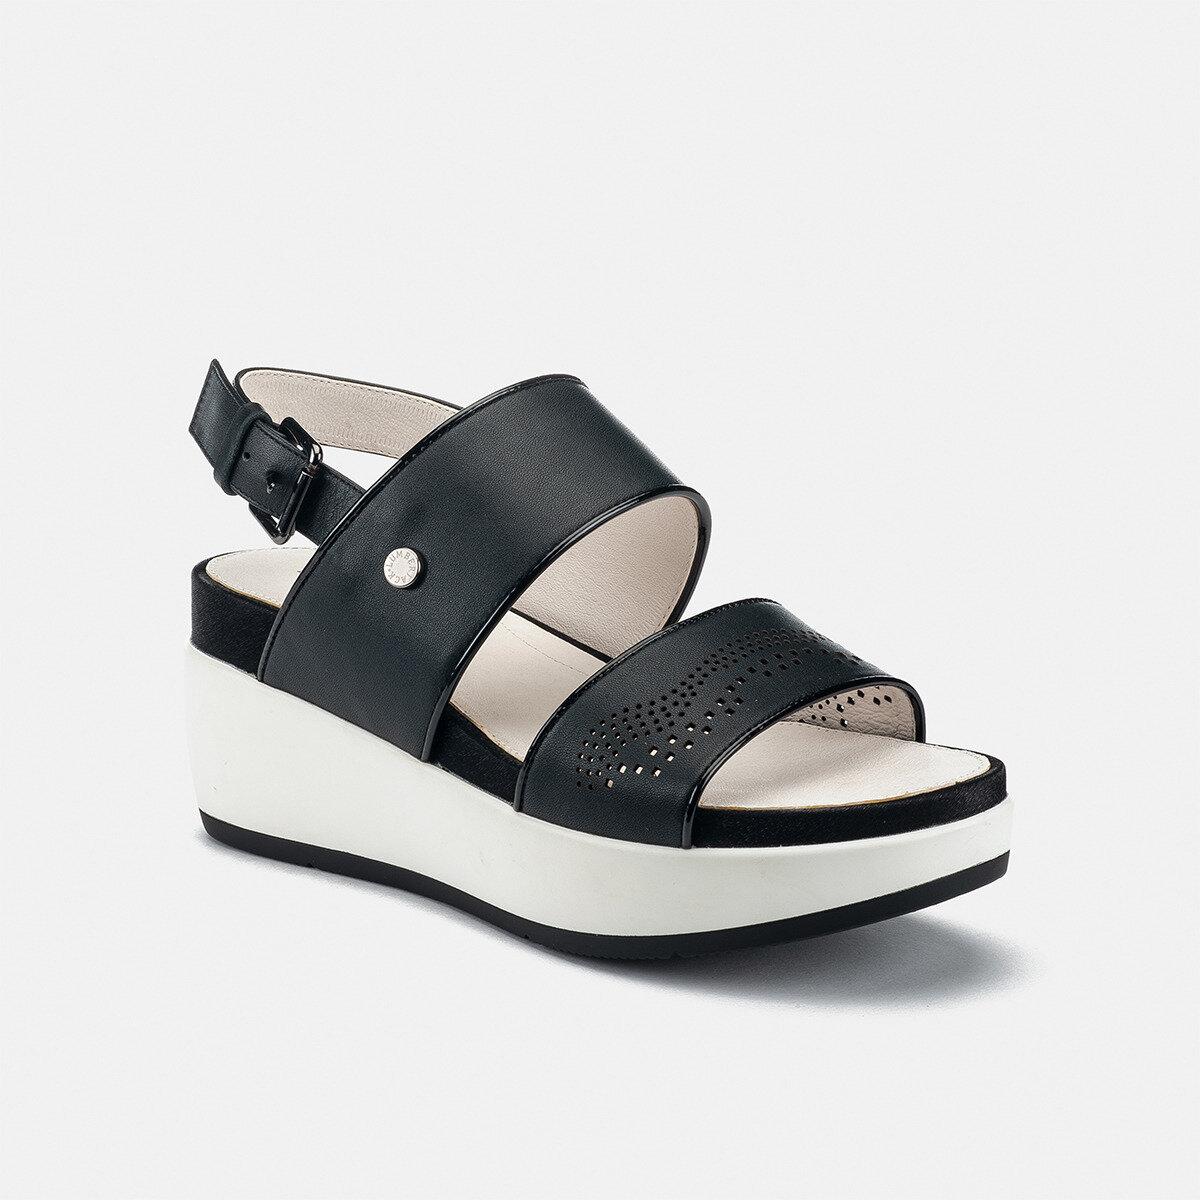 BLANCHE BLACK Woman Sandals